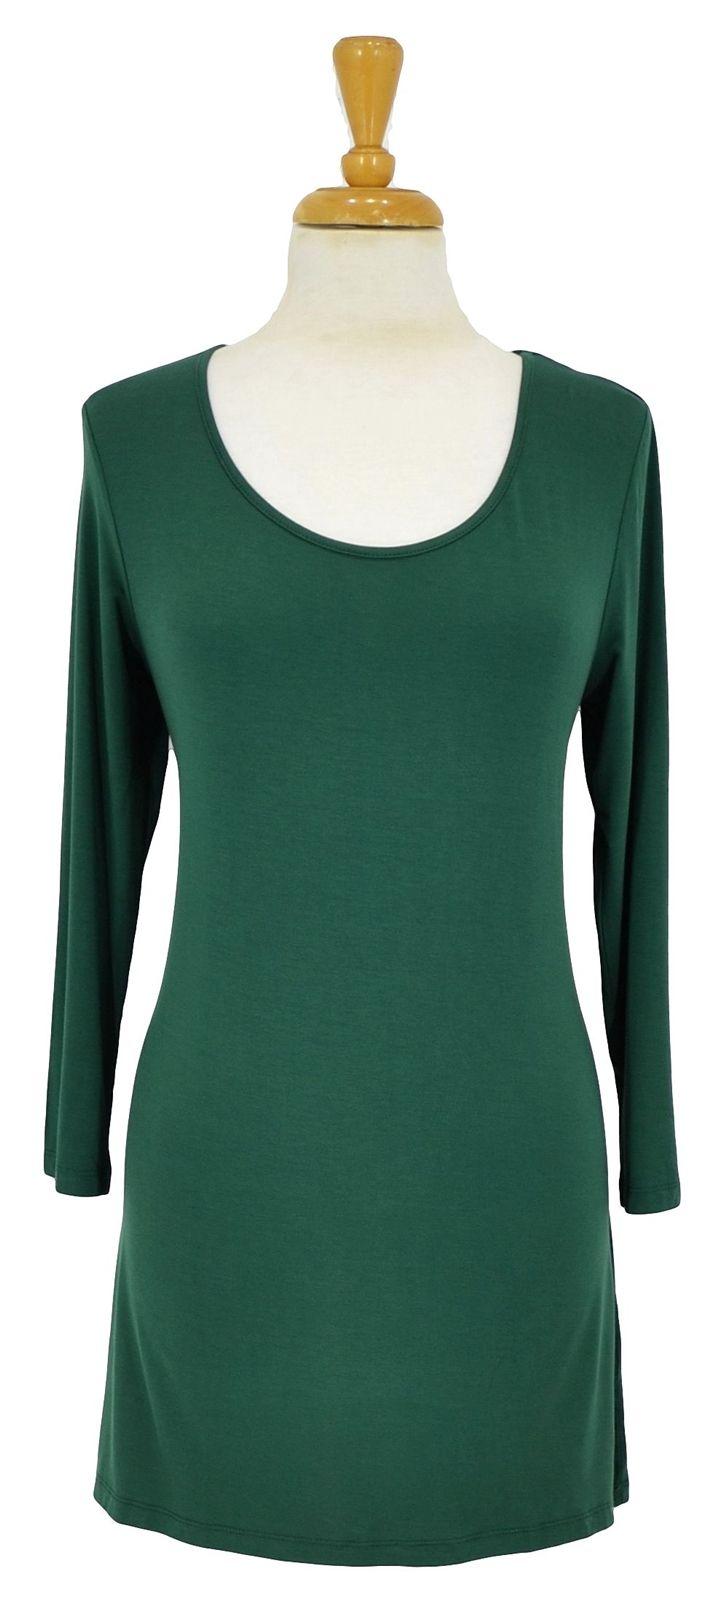 Green 3/4 Sleeve Basic ~ Best selection of Tunics & matching accessories ~ Flat postage worldwide ~ Petite to Plus sizes ~ www.ilovetunics.com